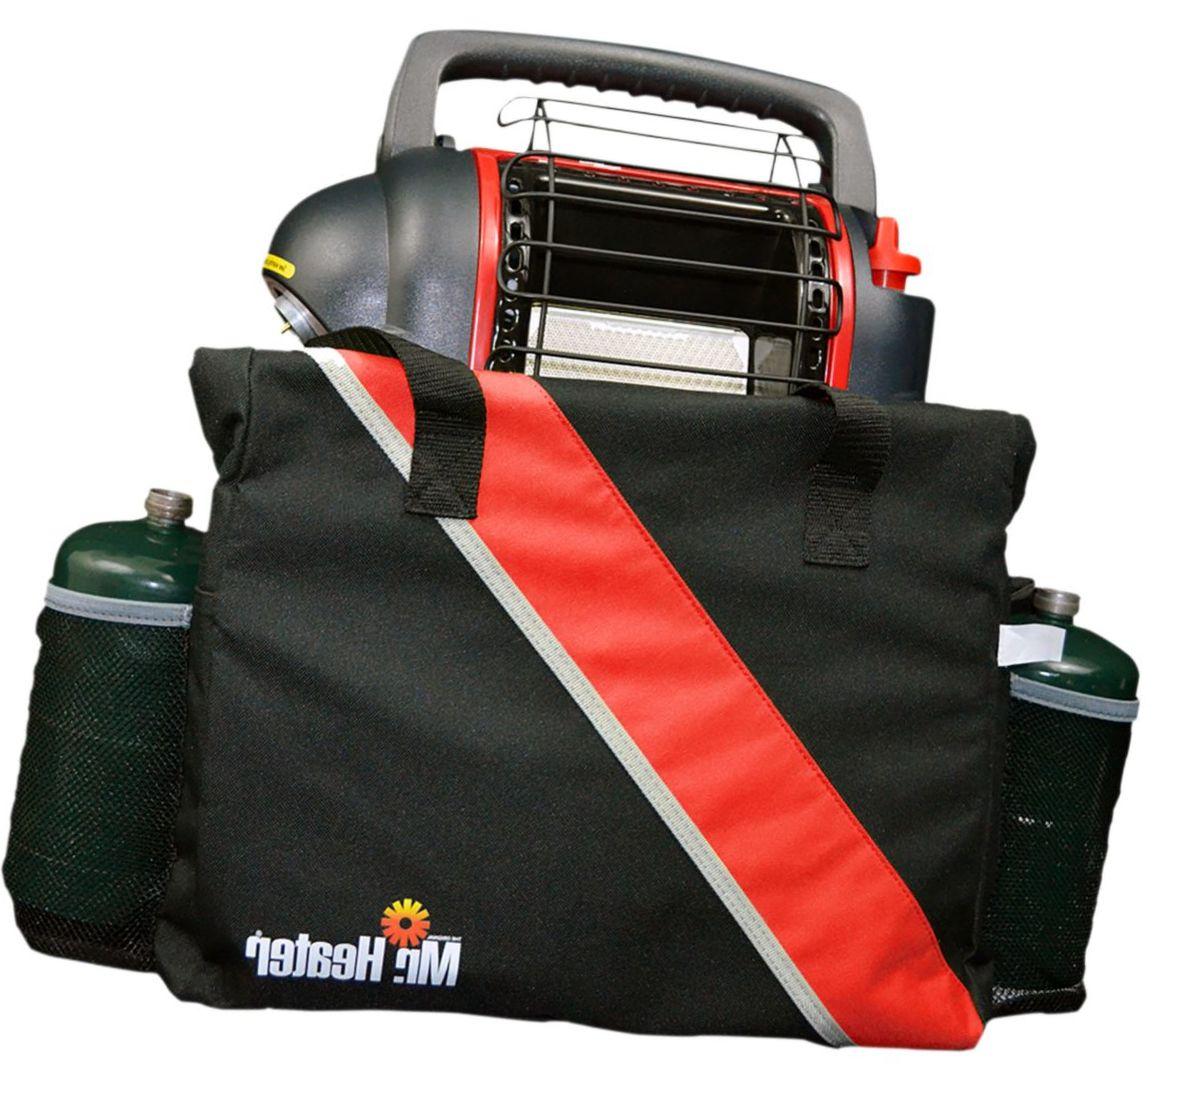 Mr. Heater® Portable Buddy Propane Heater Carry Bag